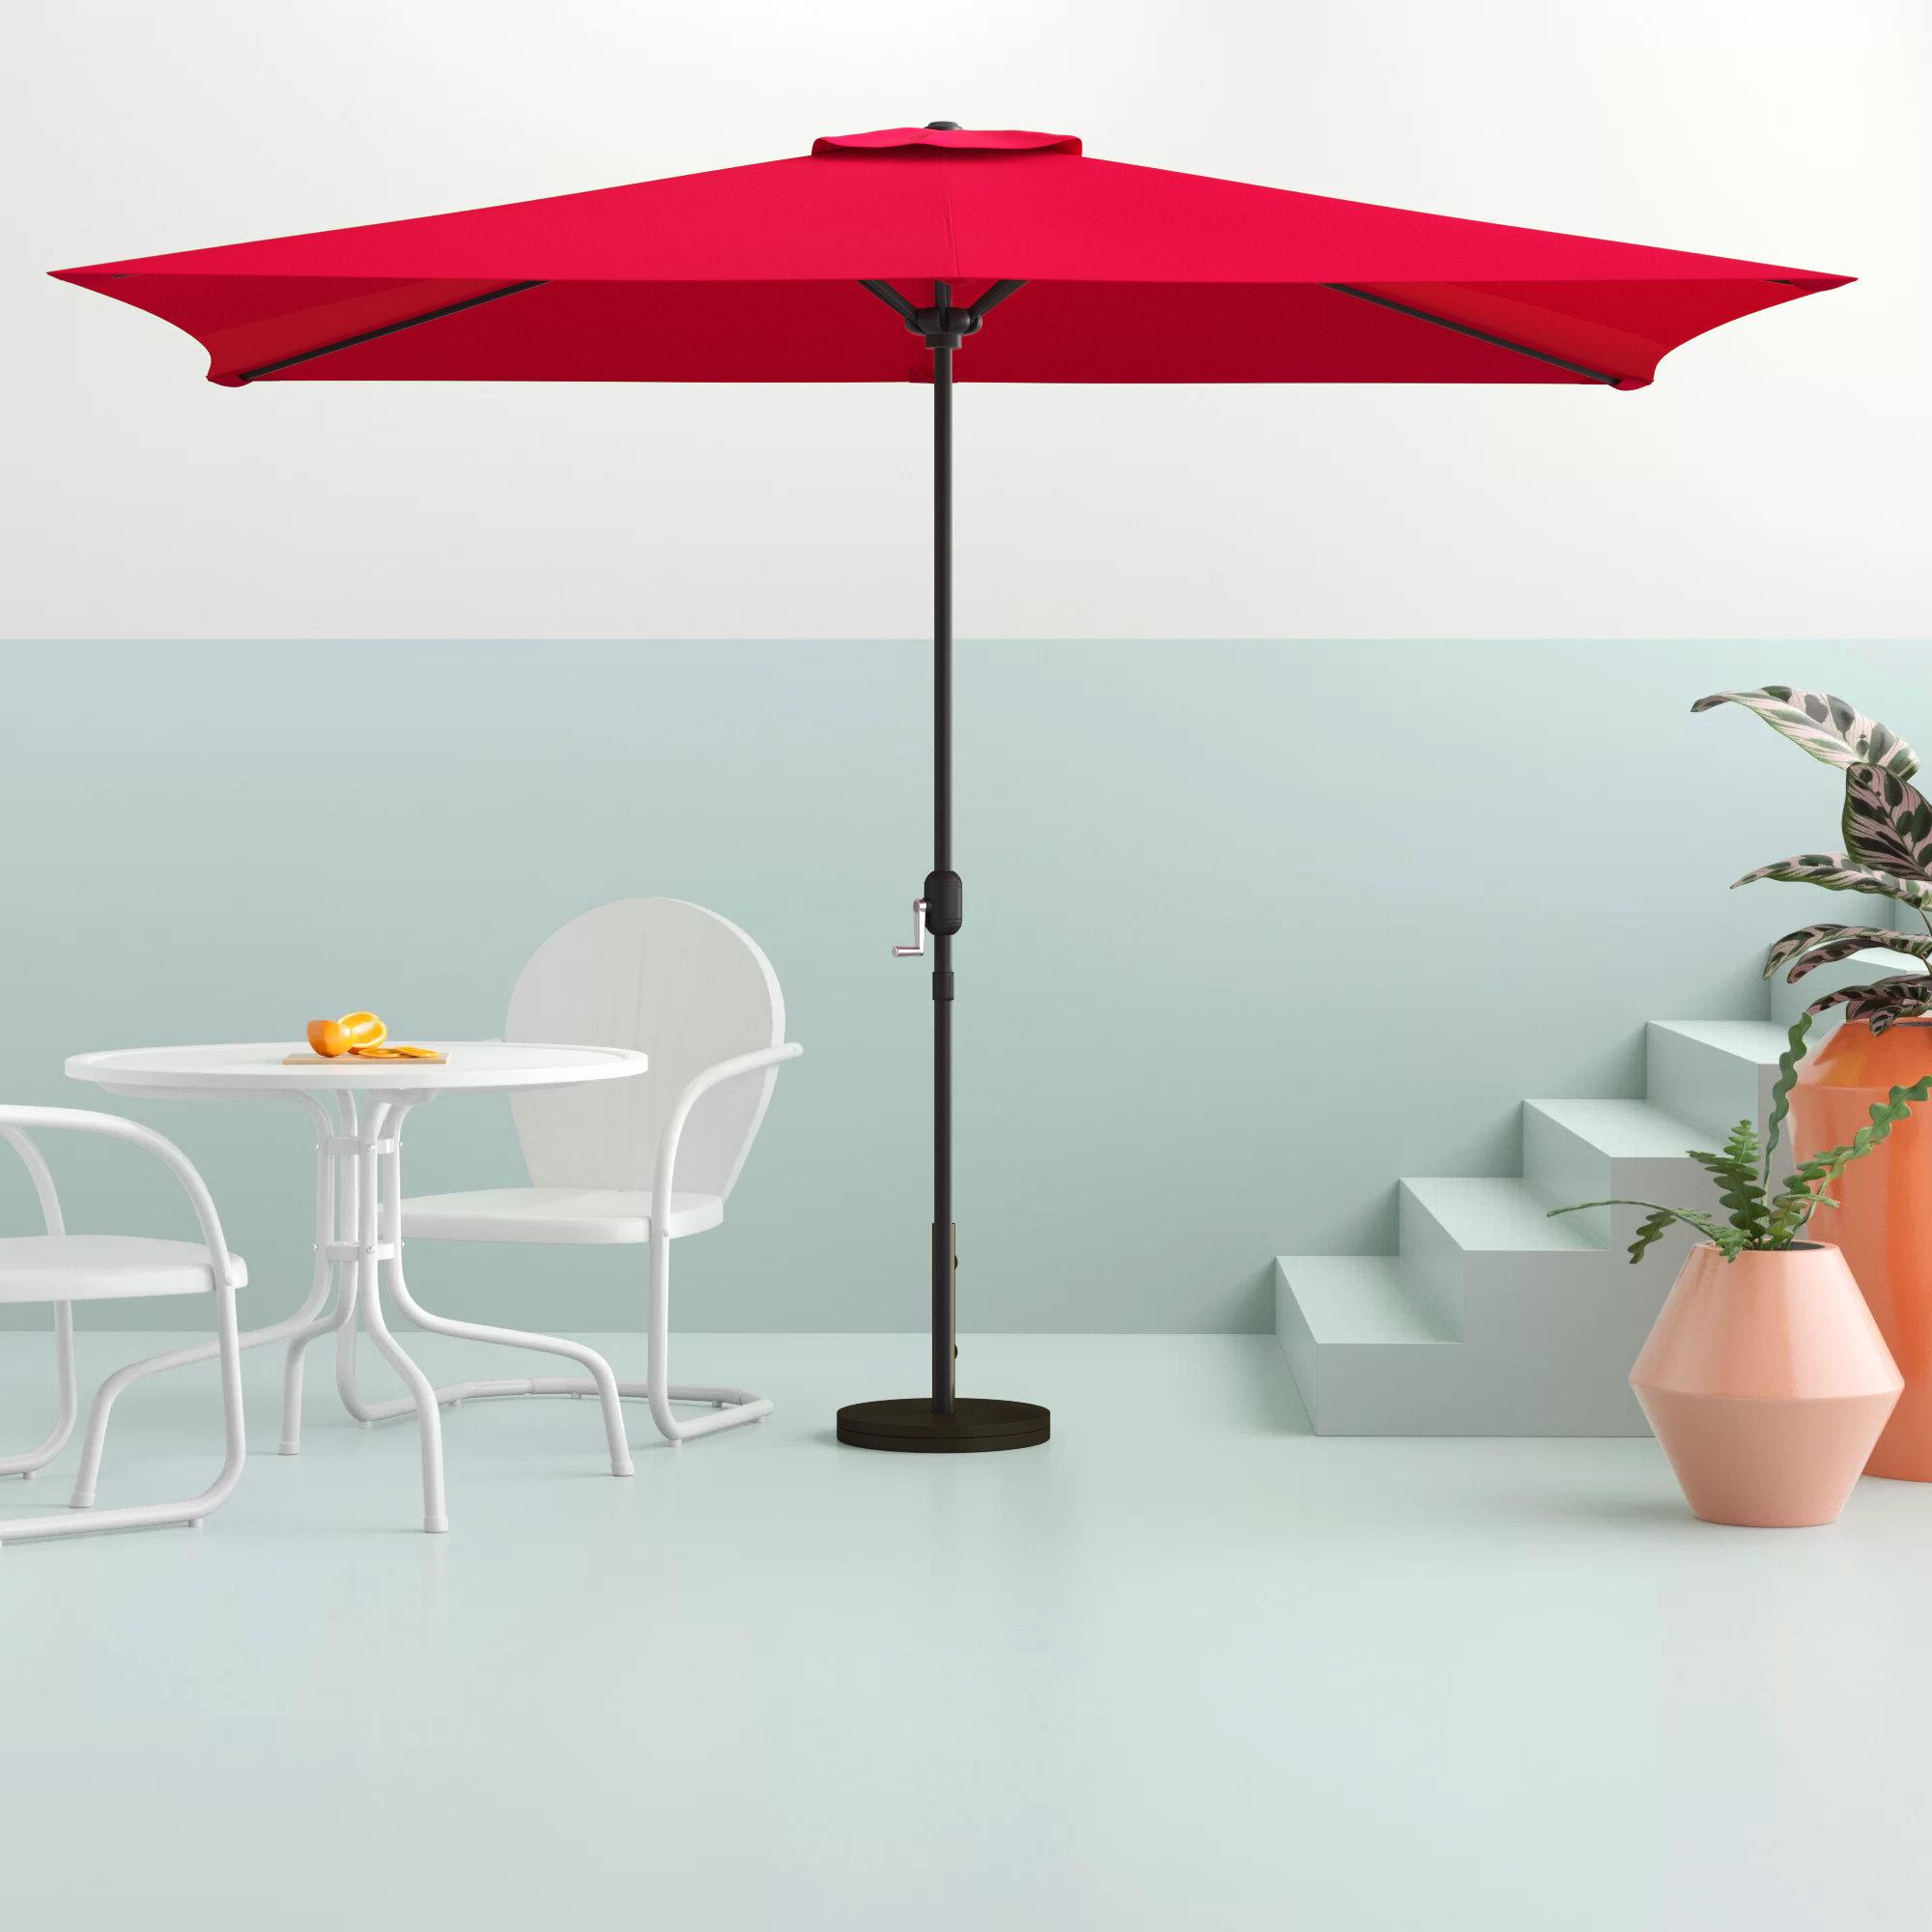 Bradford 10' X 6.5' Rectangular Market Umbrella Regarding Recent Haverhill Umbrellas (Gallery 4 of 20)